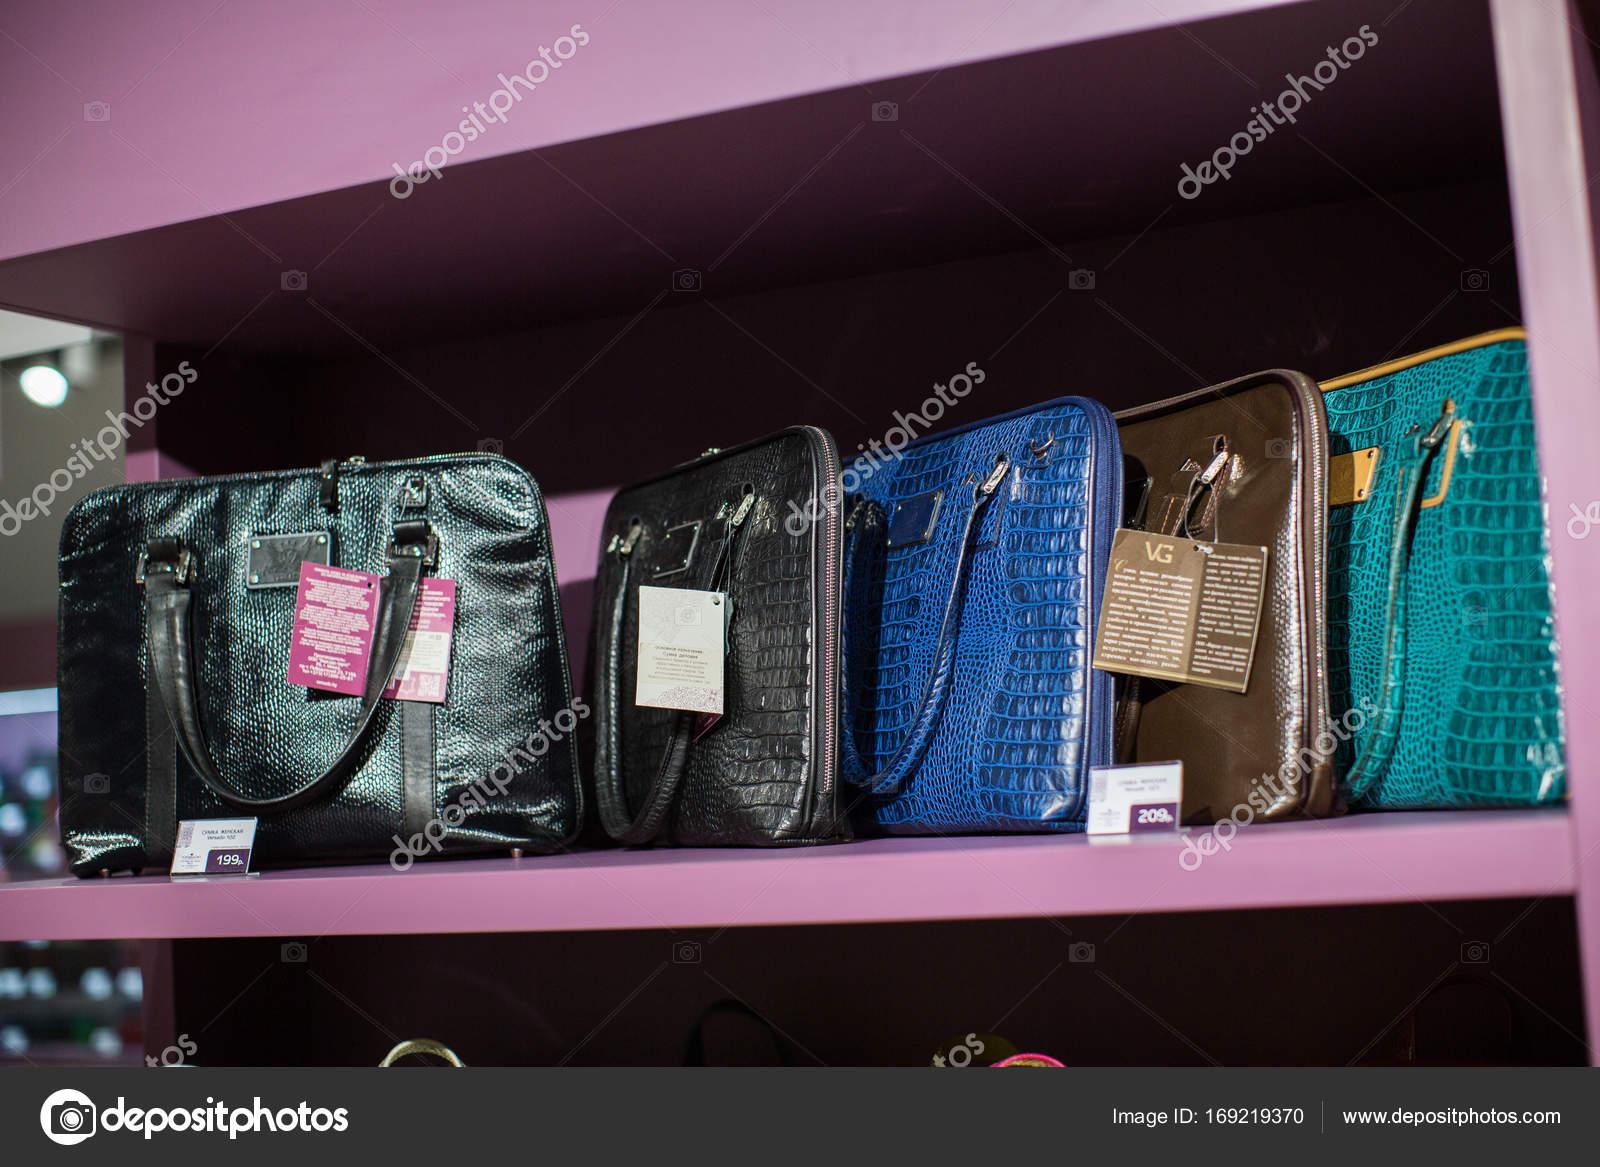 86ab56273b Δερμάτινες τσάντες και αξεσουάρ για την πώληση σε βιτρίνα καταστήματος —  Εικόνα από fotoevent.stock